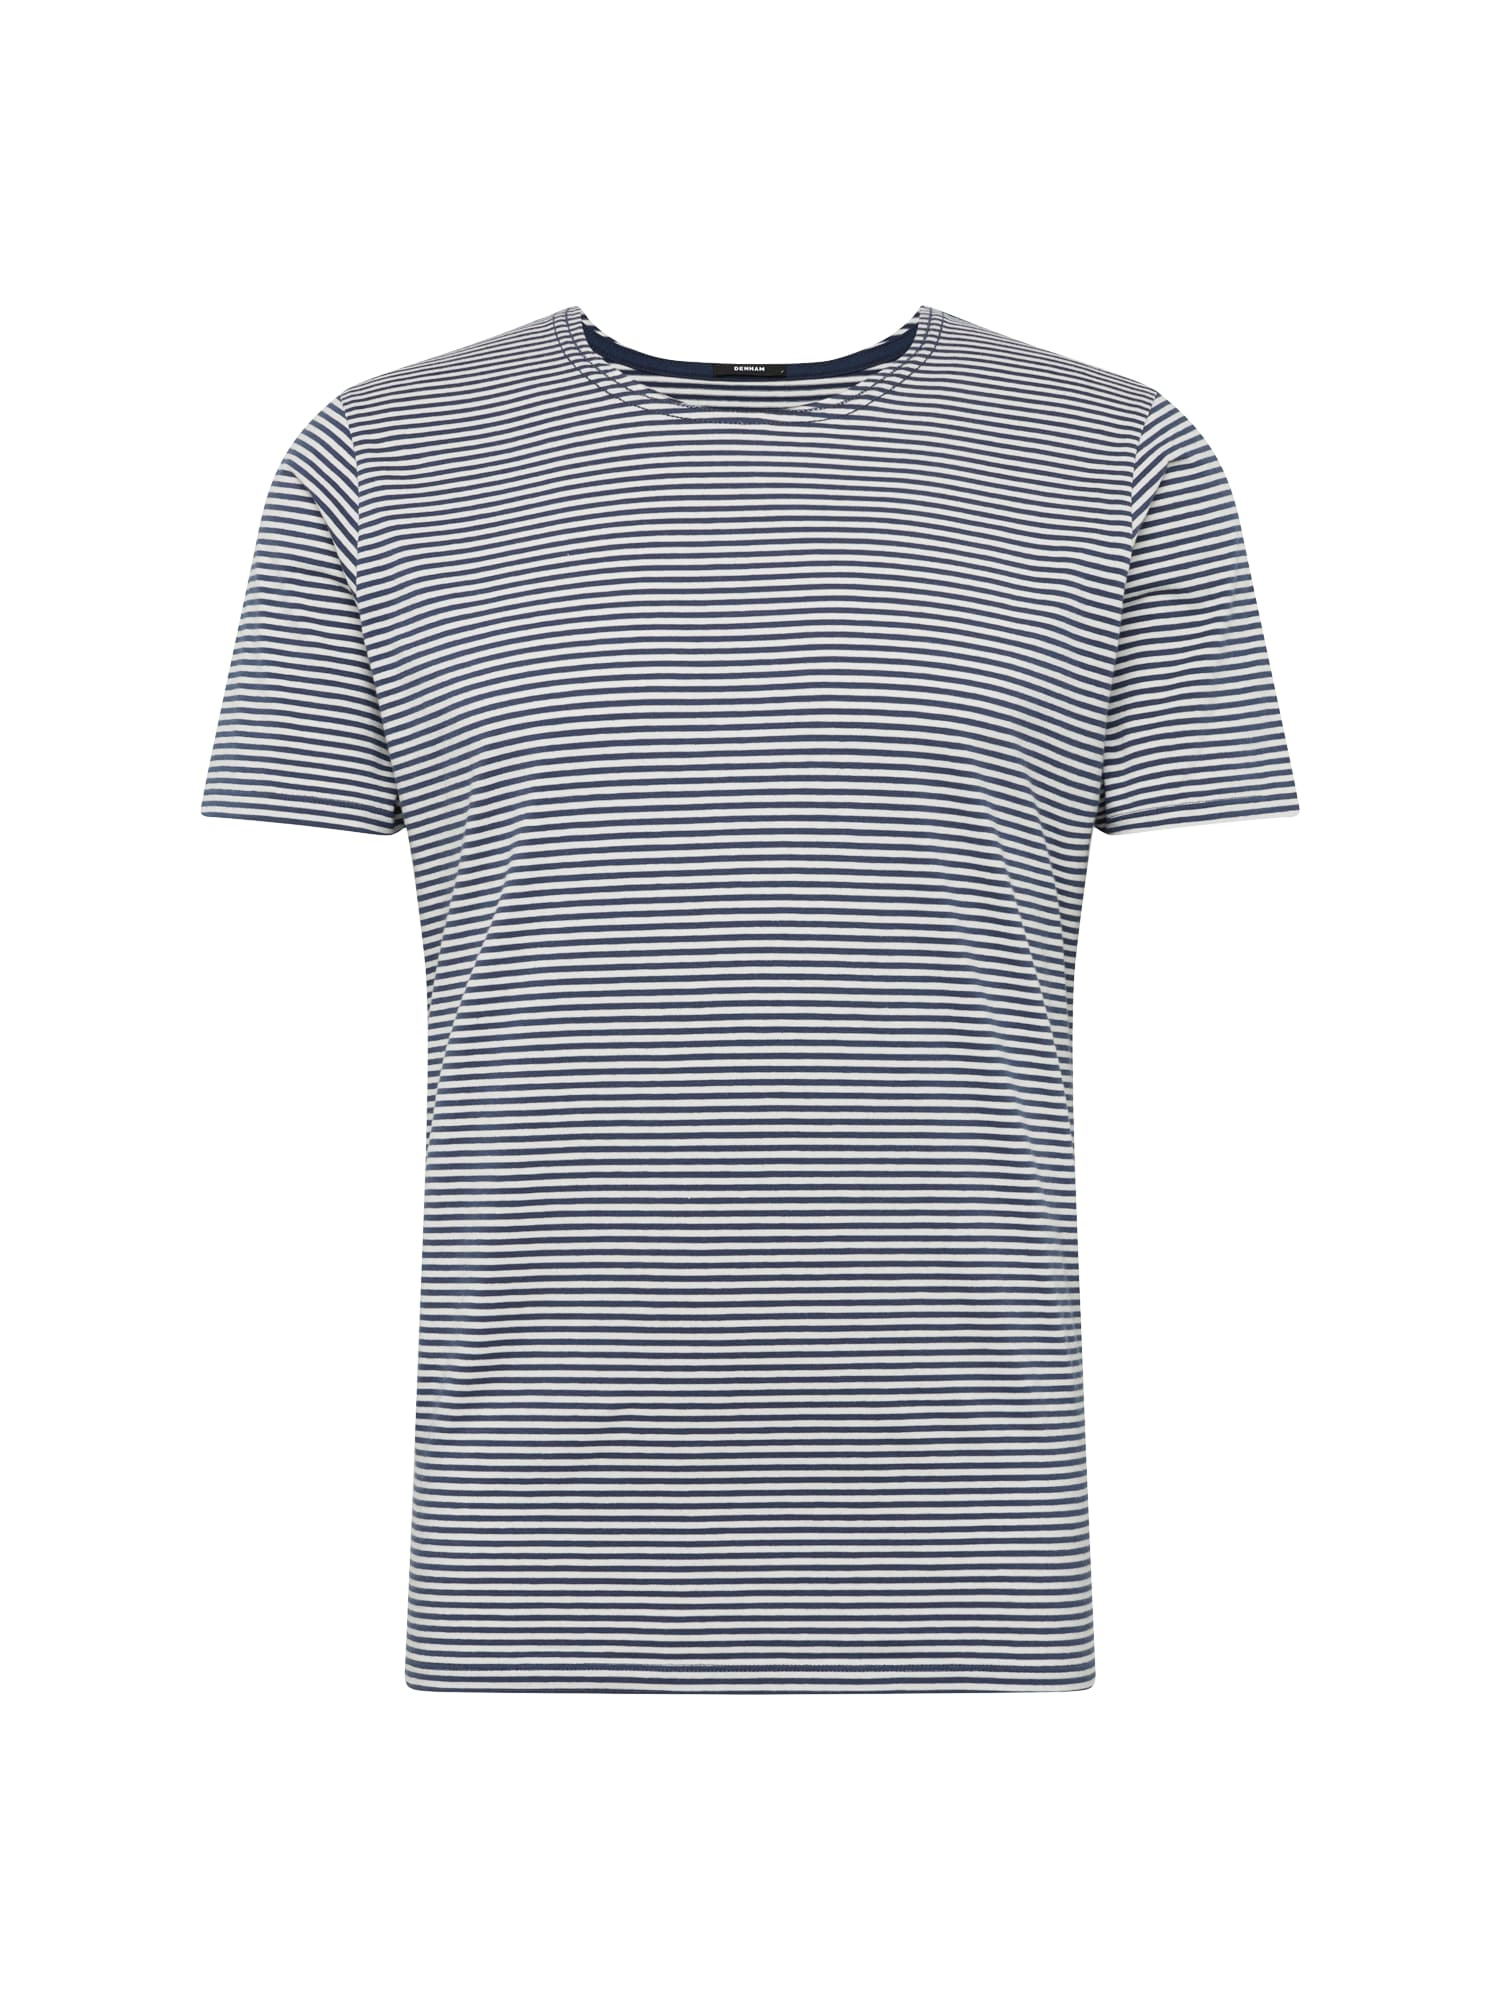 Tričko RUFF NECK CREW TEE J námořnická modř bílá DENHAM